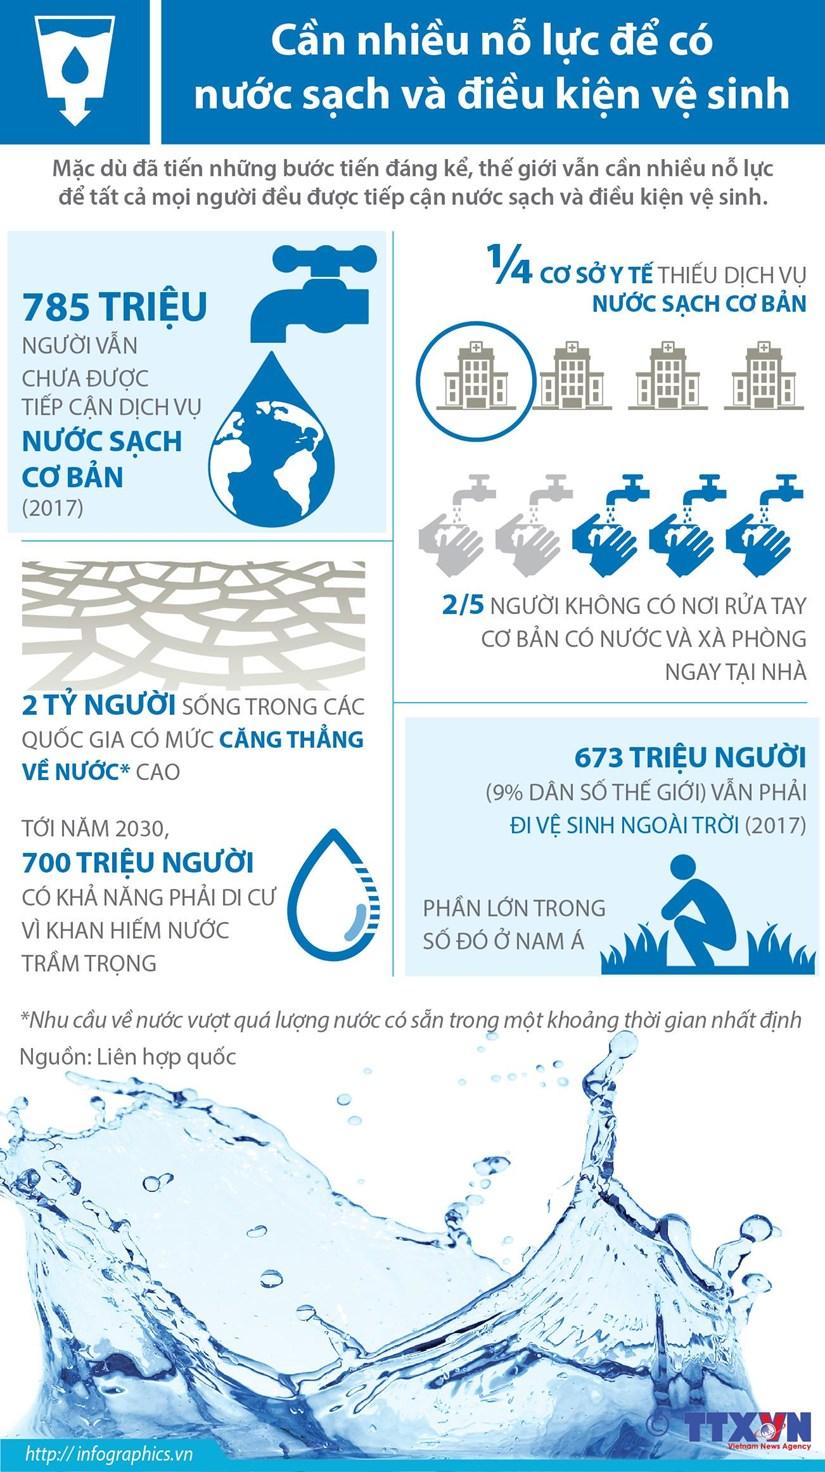 [Infographics] Can nhieu no luc de co nuoc sach va dieu kien ve sinh hinh anh 1